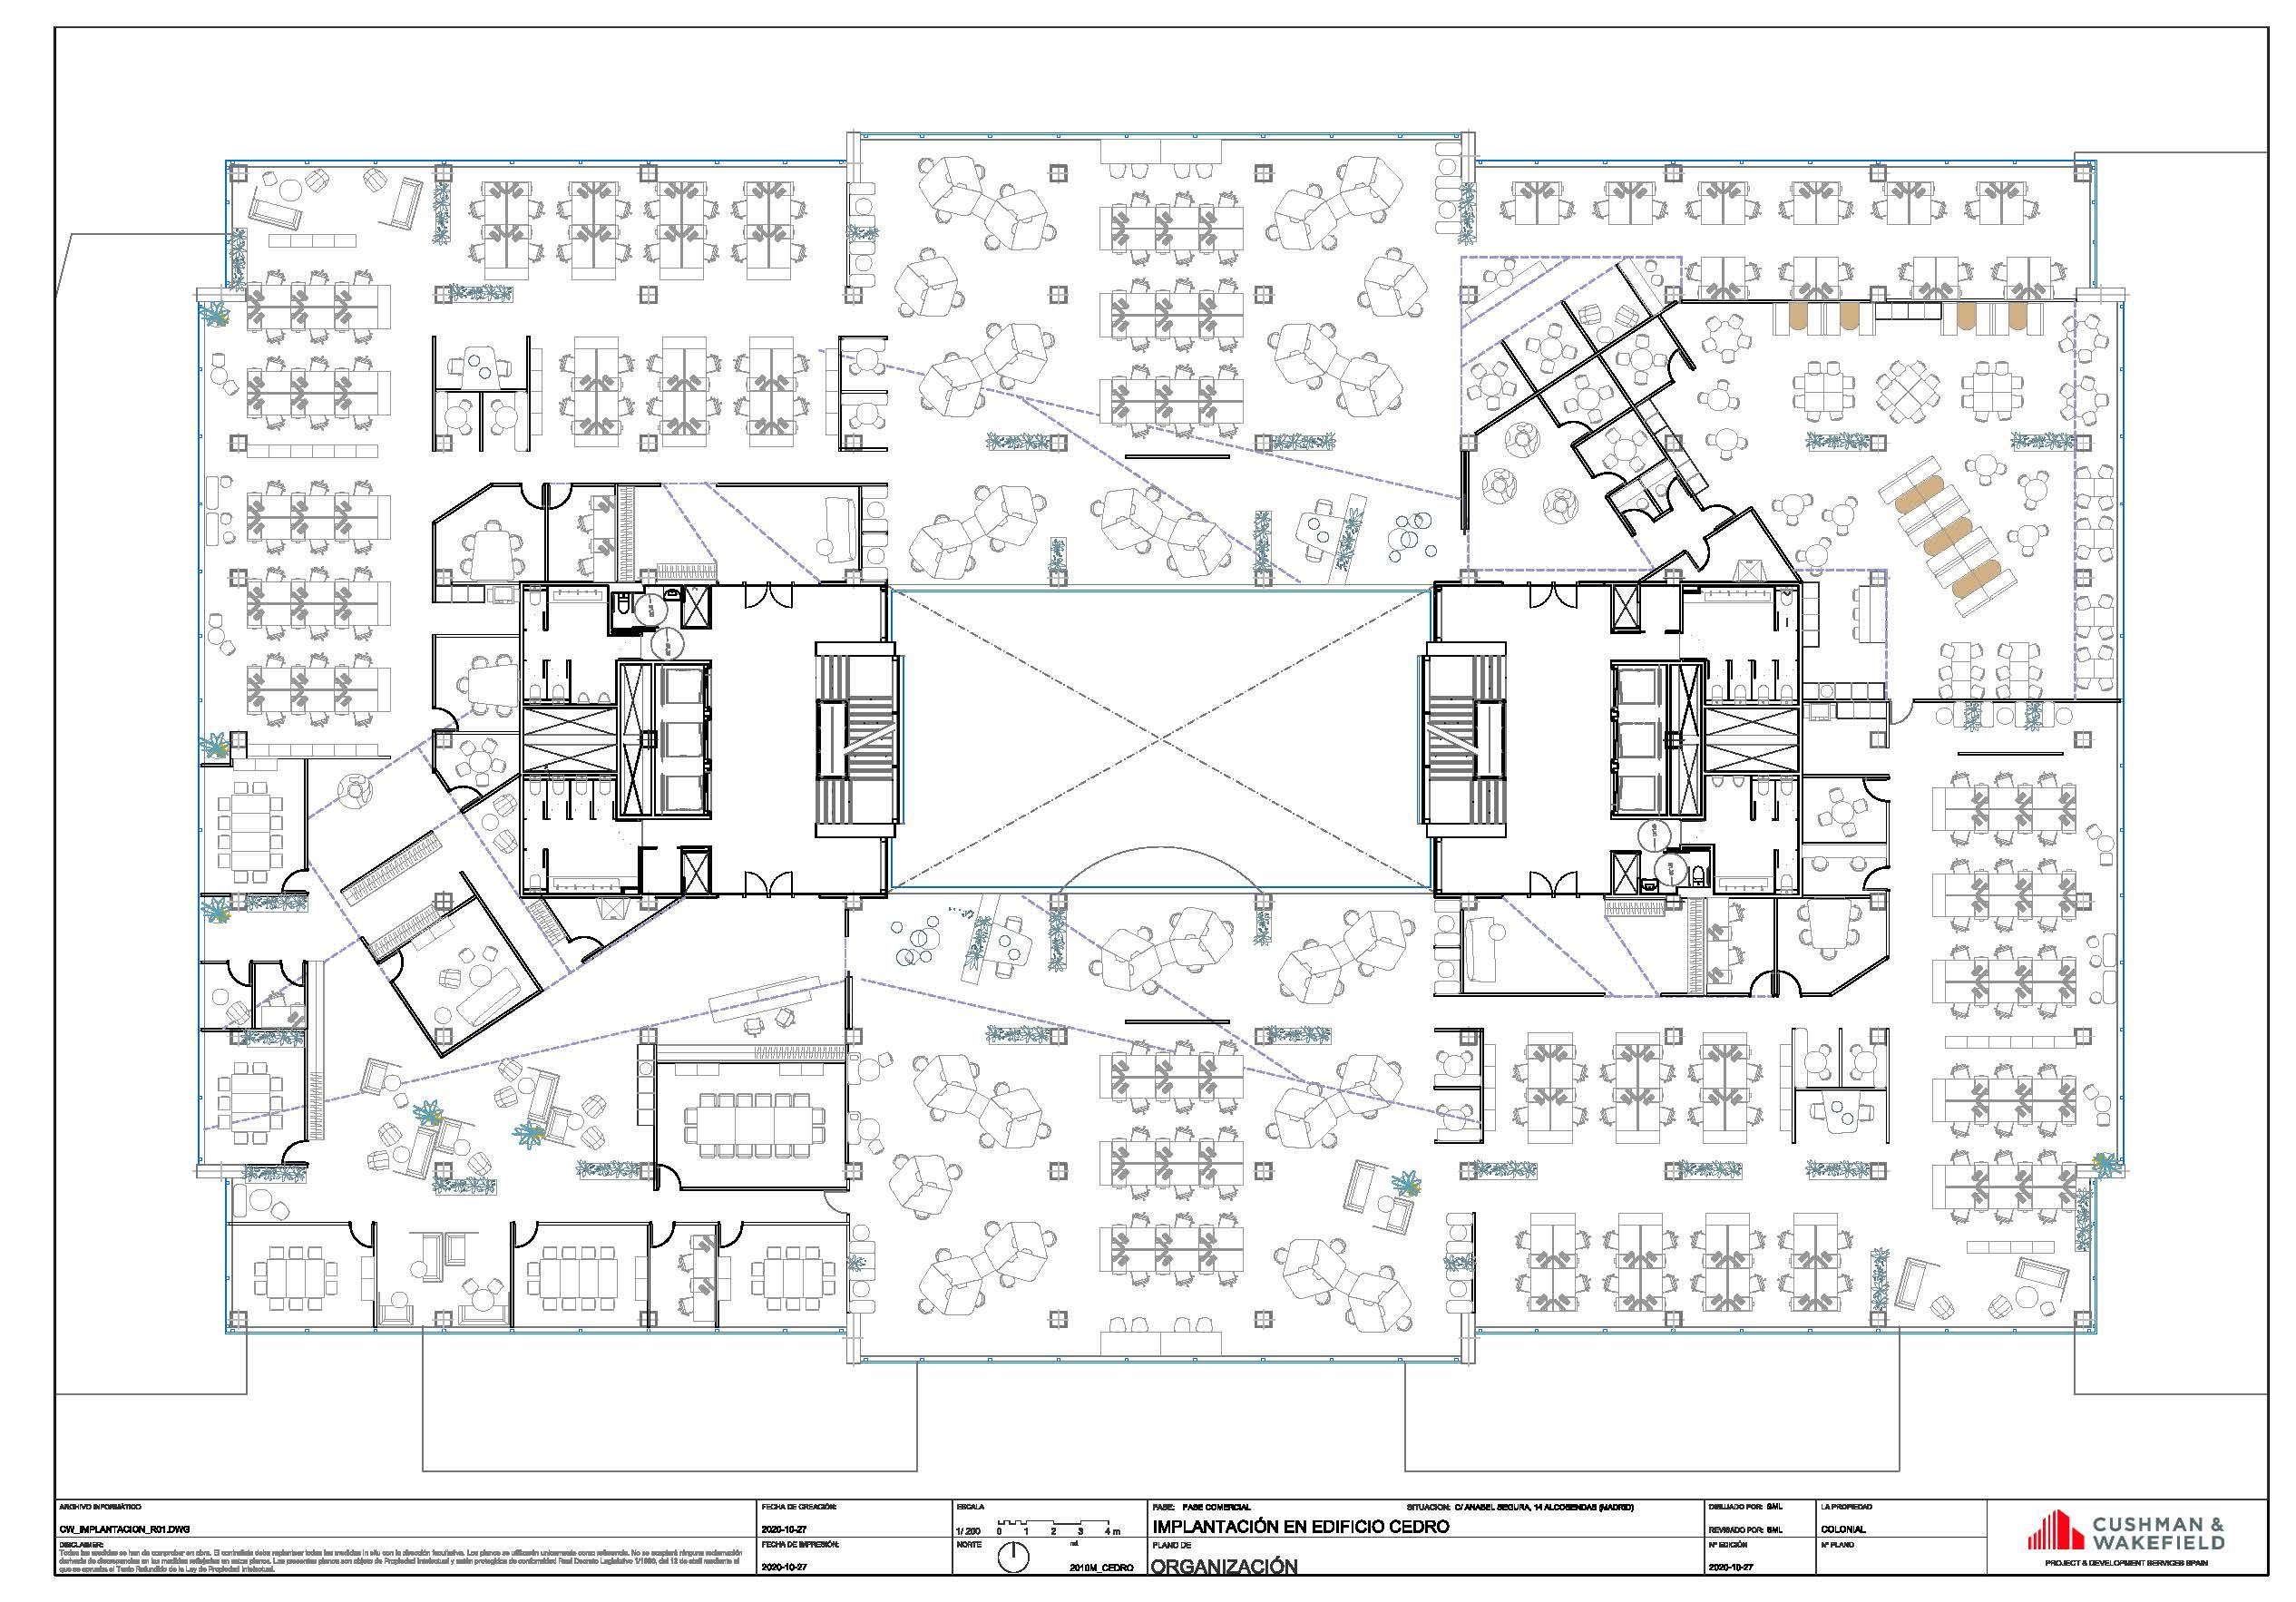 Alquiler de oficinas en P.E. ARROYO DE LA VEGA – EDIFICIO CEDRO – Anabel Segura, 14